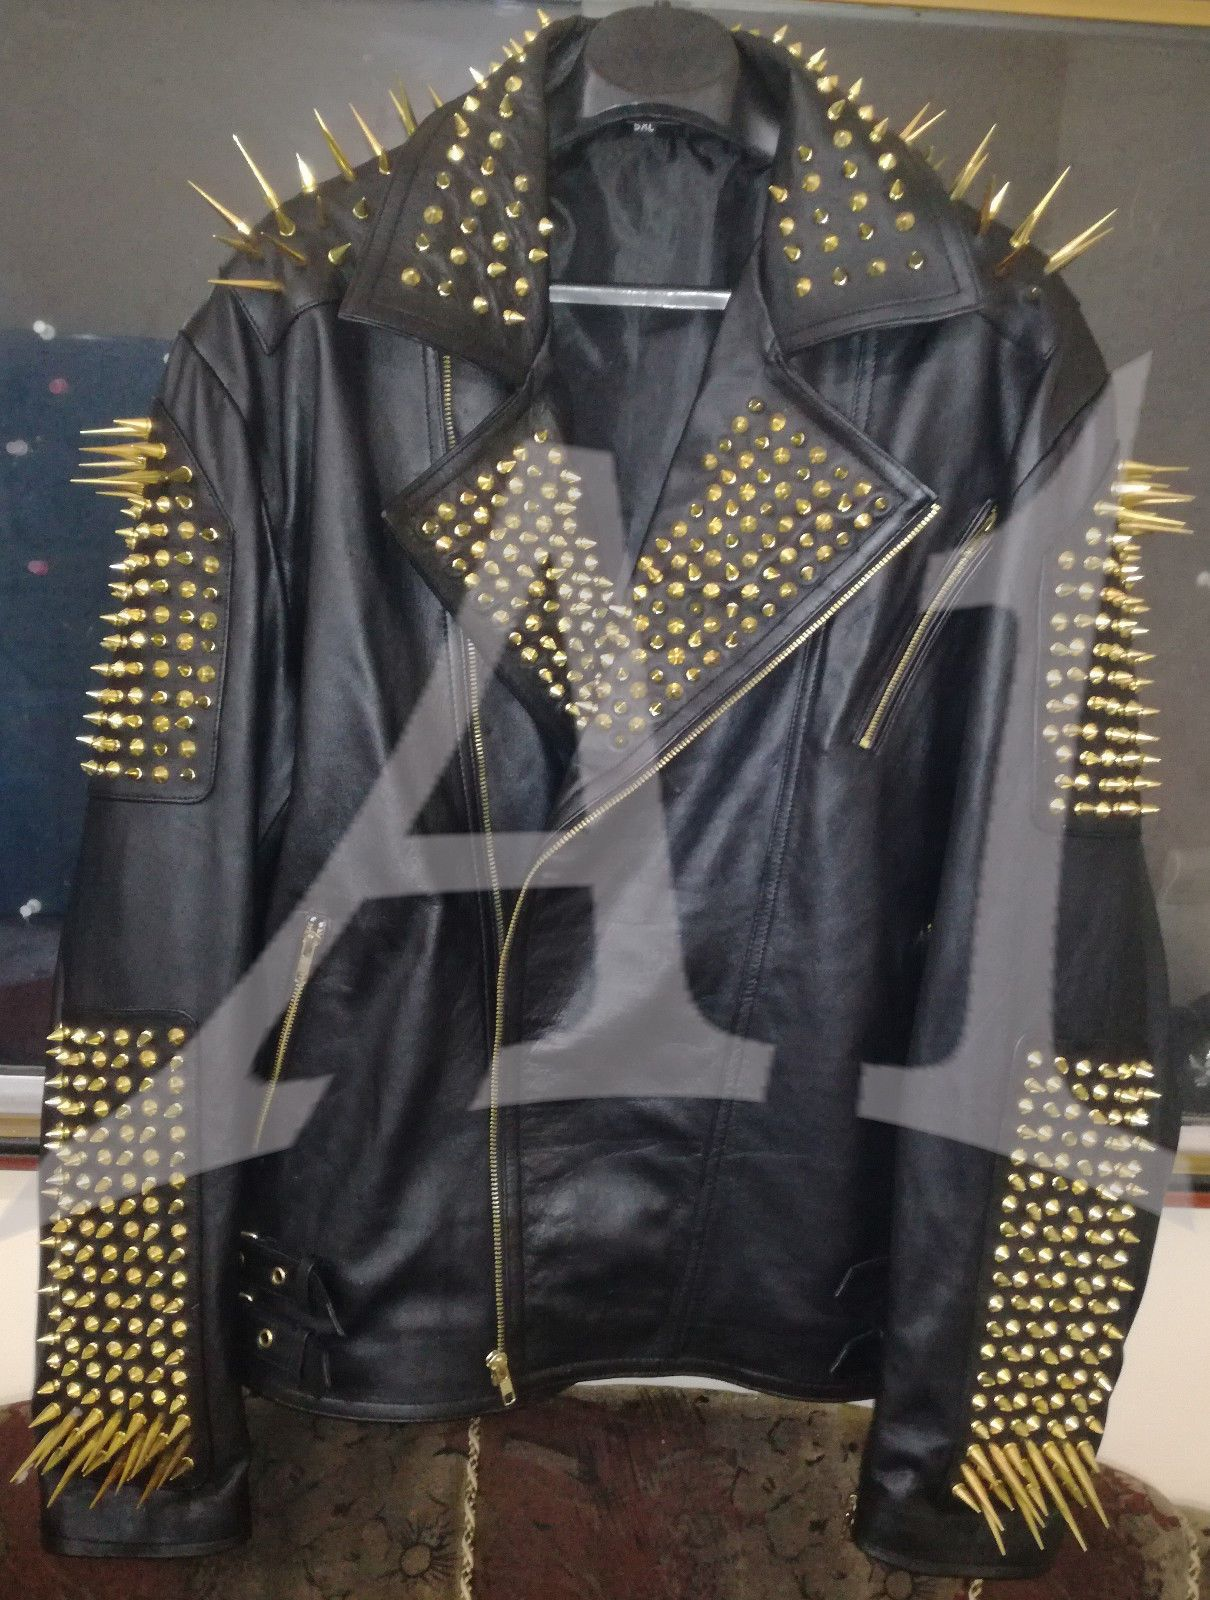 Mens Punk Style Full Black Biker Golden Long Spikes Studded Leather Jacket Coats Jackets Leather Jacket Style Leather Jacket Studded Leather Jacket [ 1600 x 1210 Pixel ]